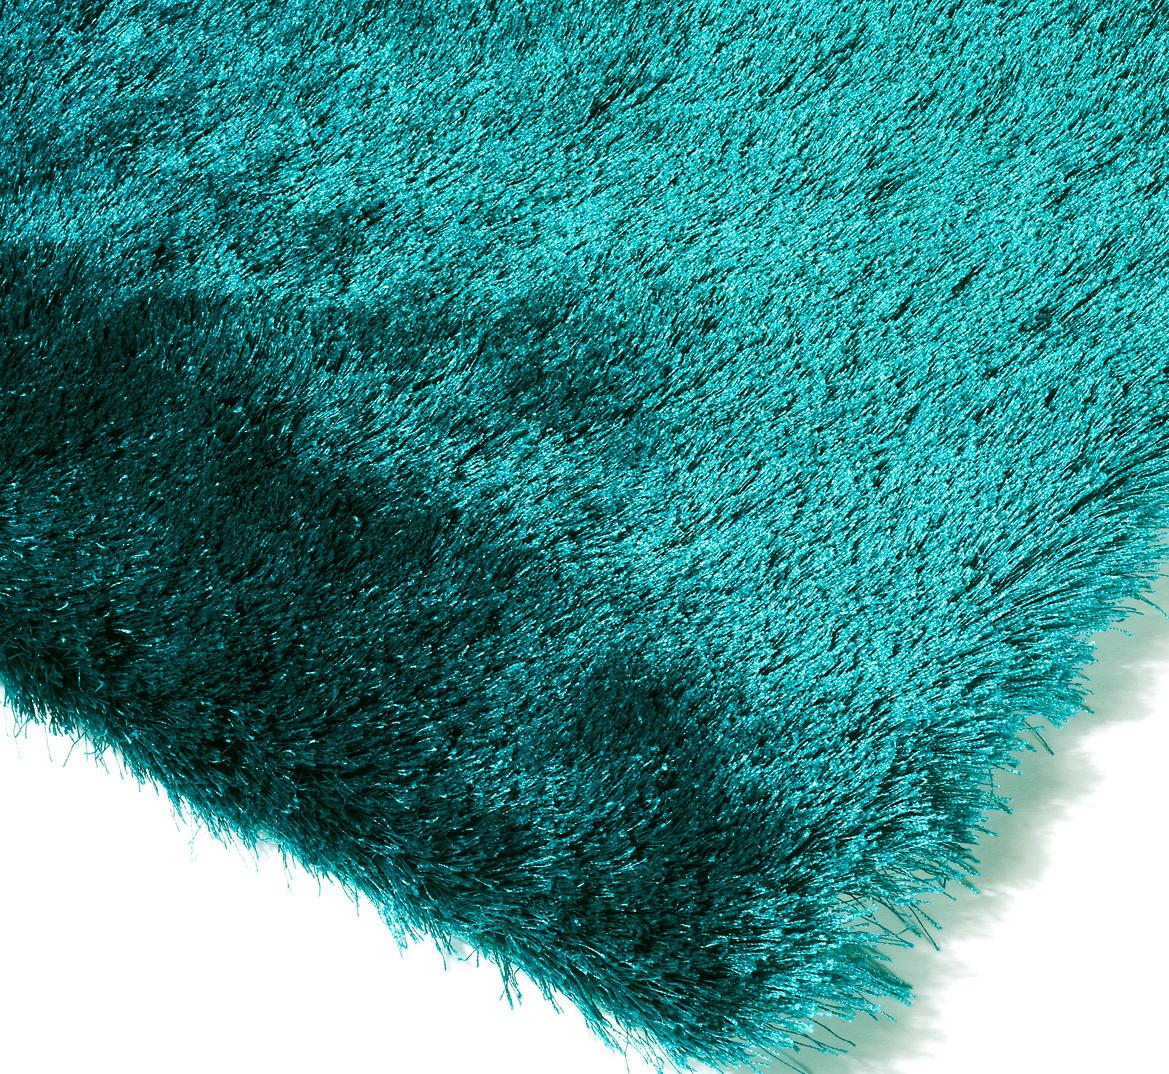 riga dark teal rug shaggy rug asiatic. Black Bedroom Furniture Sets. Home Design Ideas